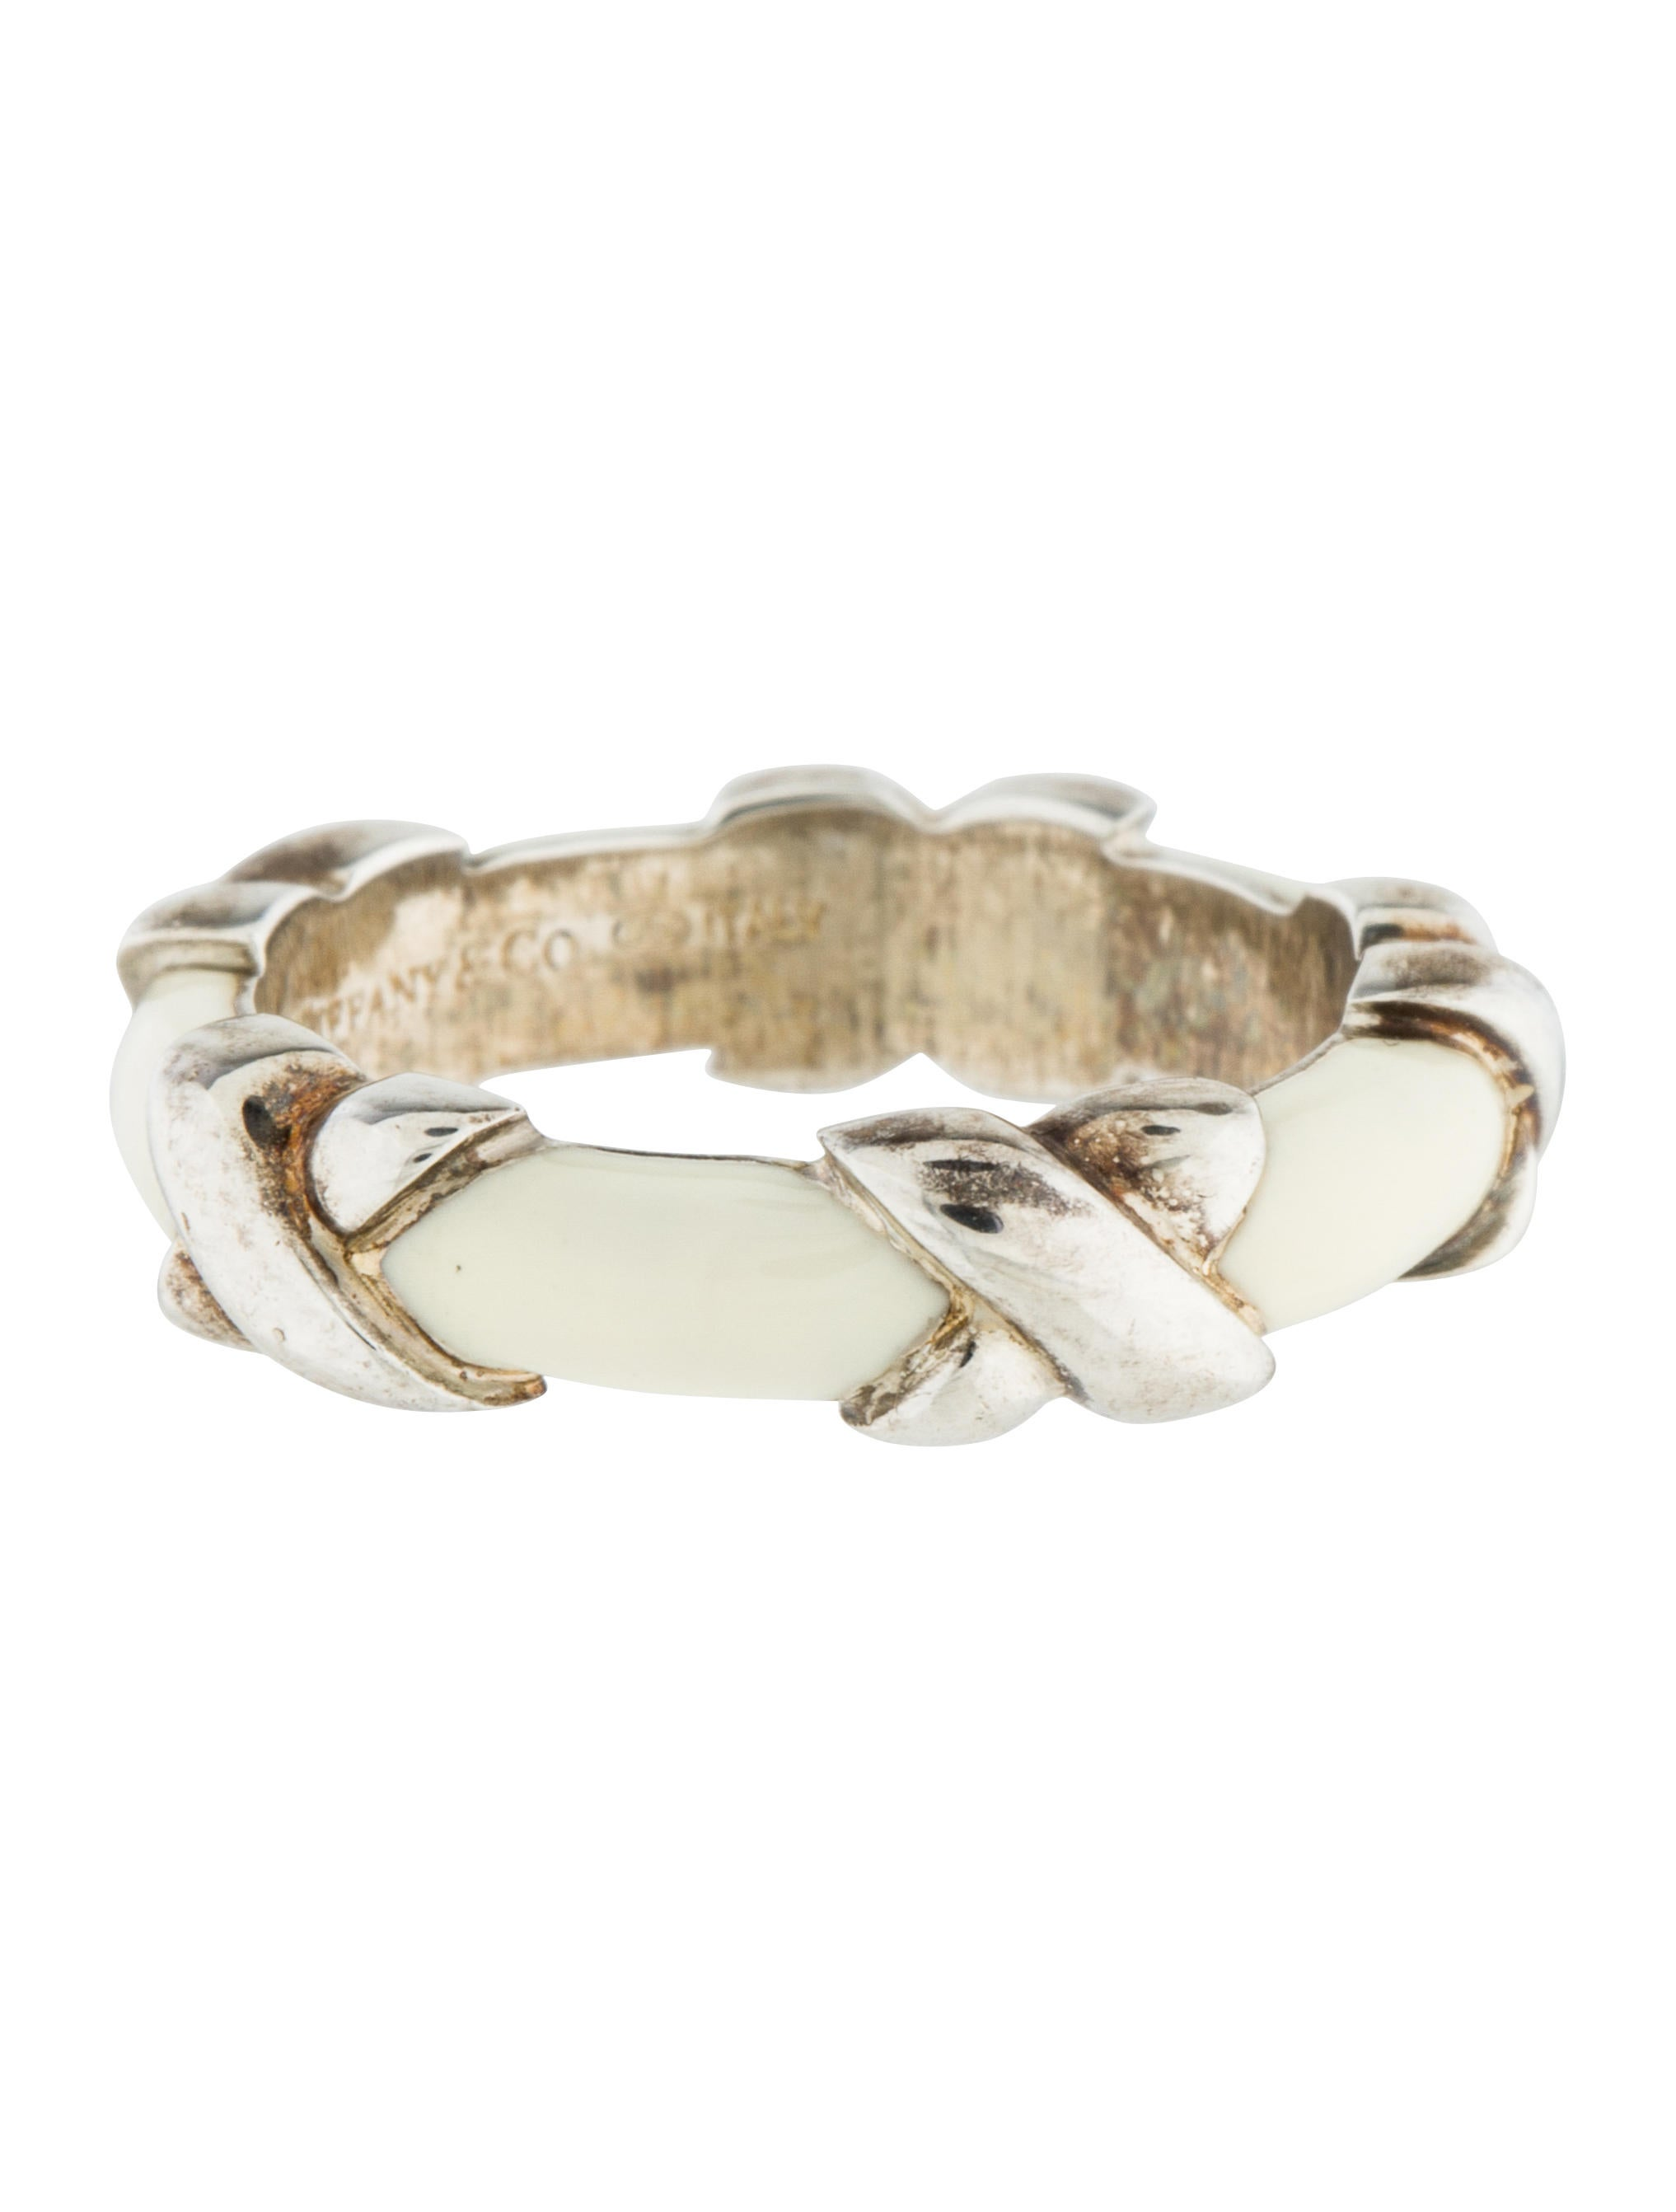 Tiffany Amp Co Enamel X Band Ring Rings Tif53170 The